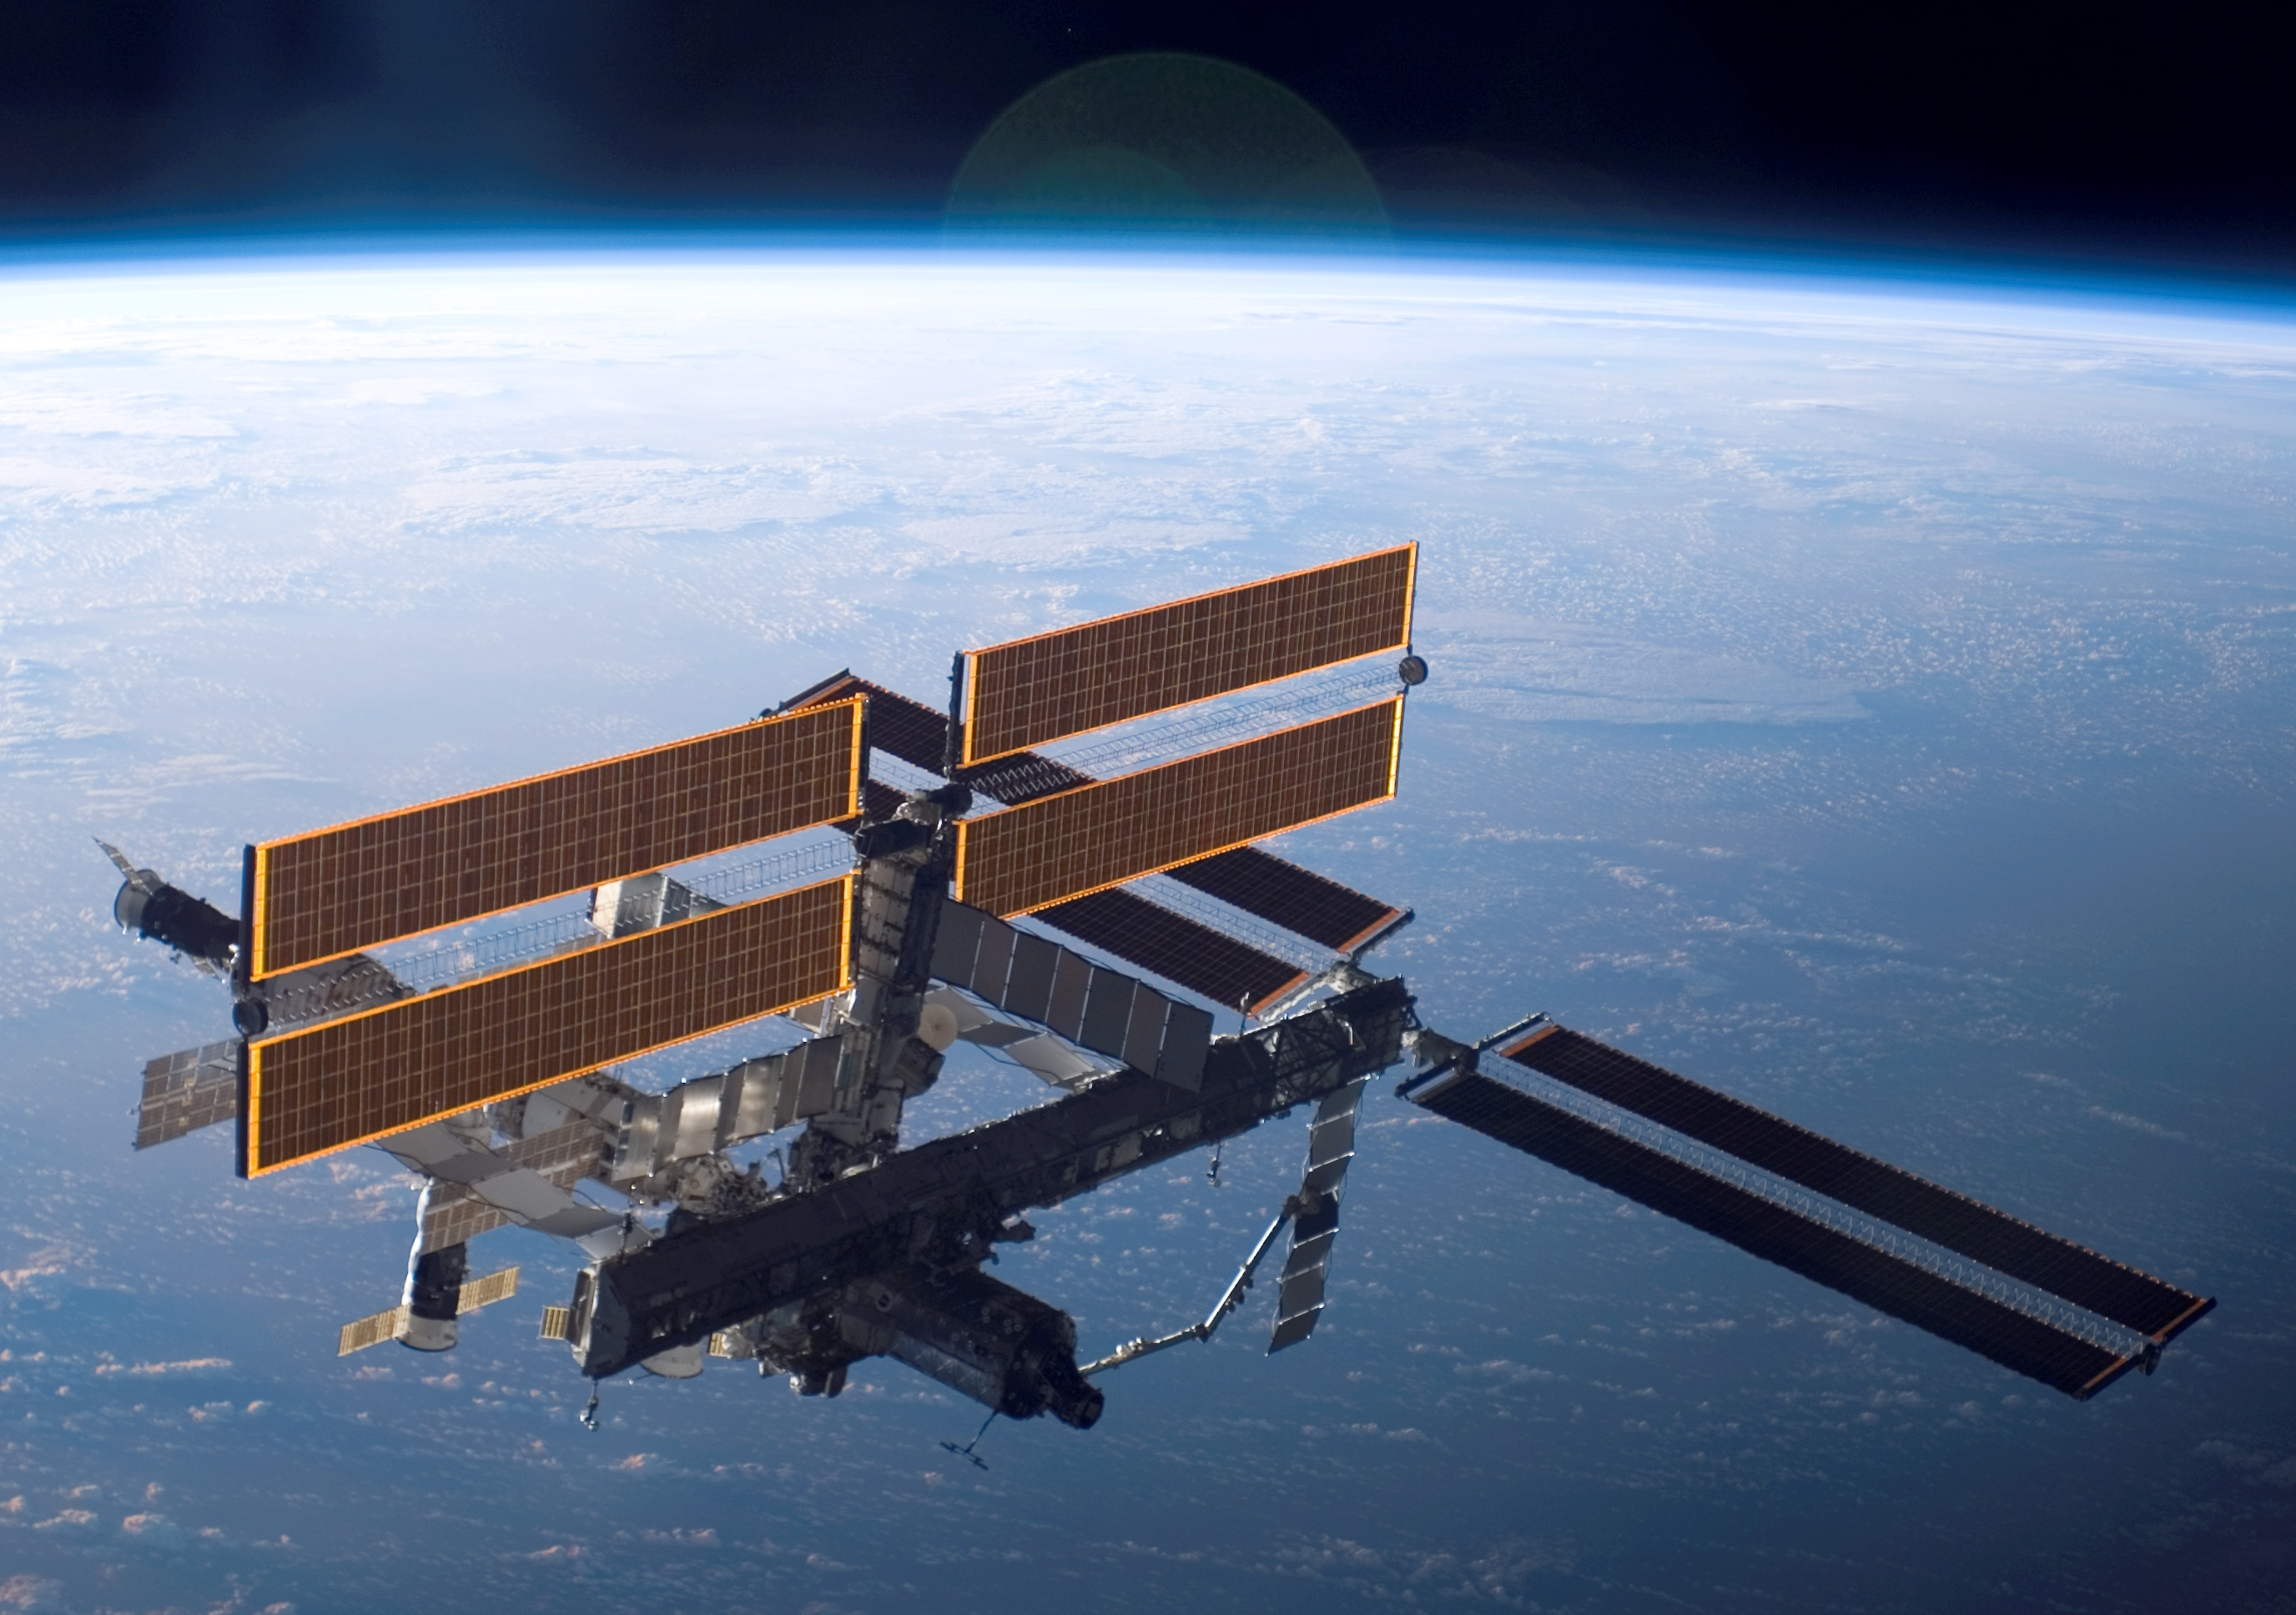 international space station sightings - HD2752×1936